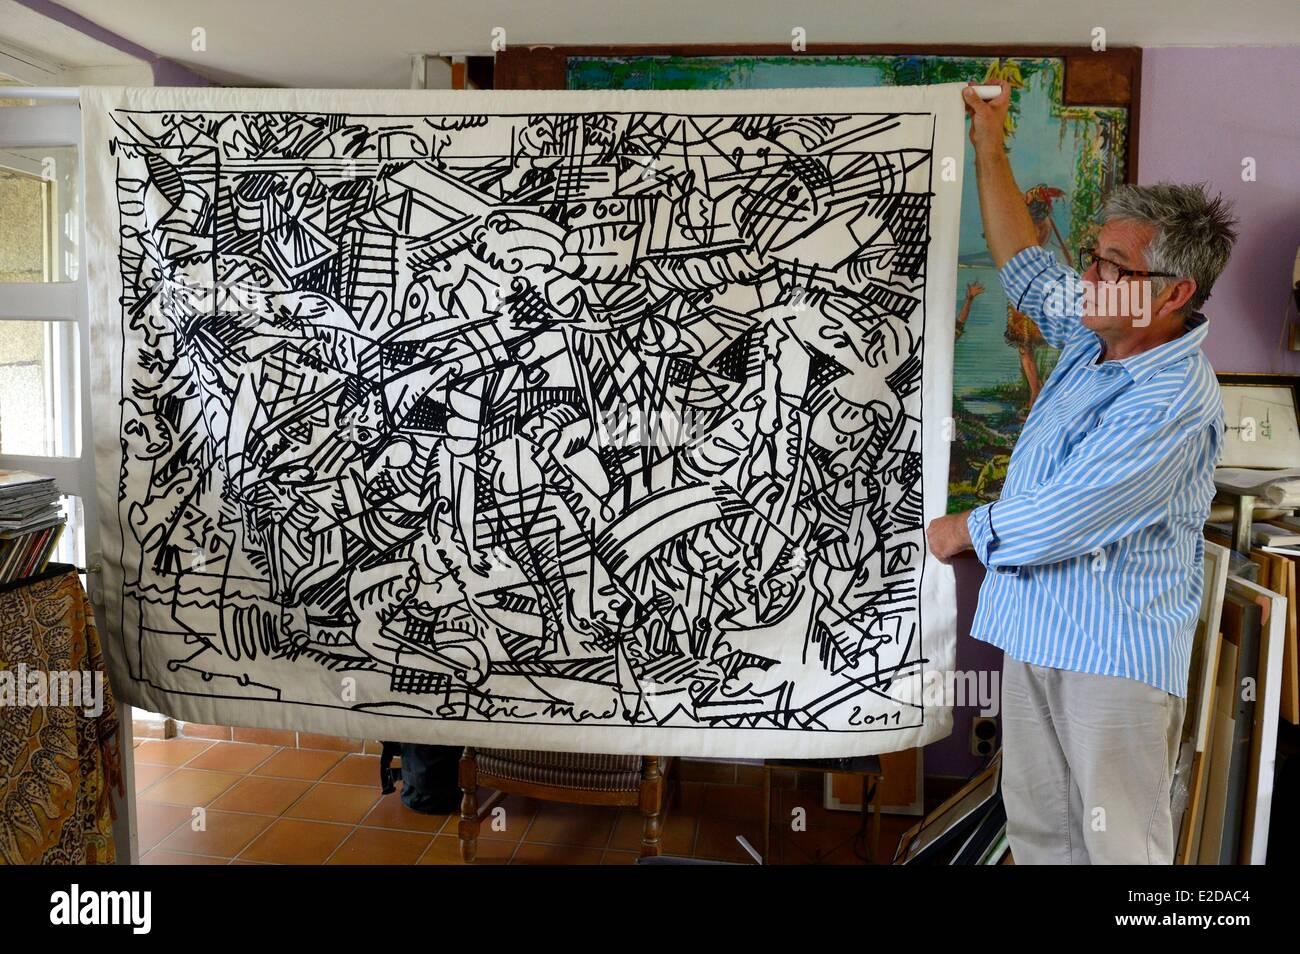 France Finistere Prat Ar Coum workshop of the painter Loic Madec - Stock Image